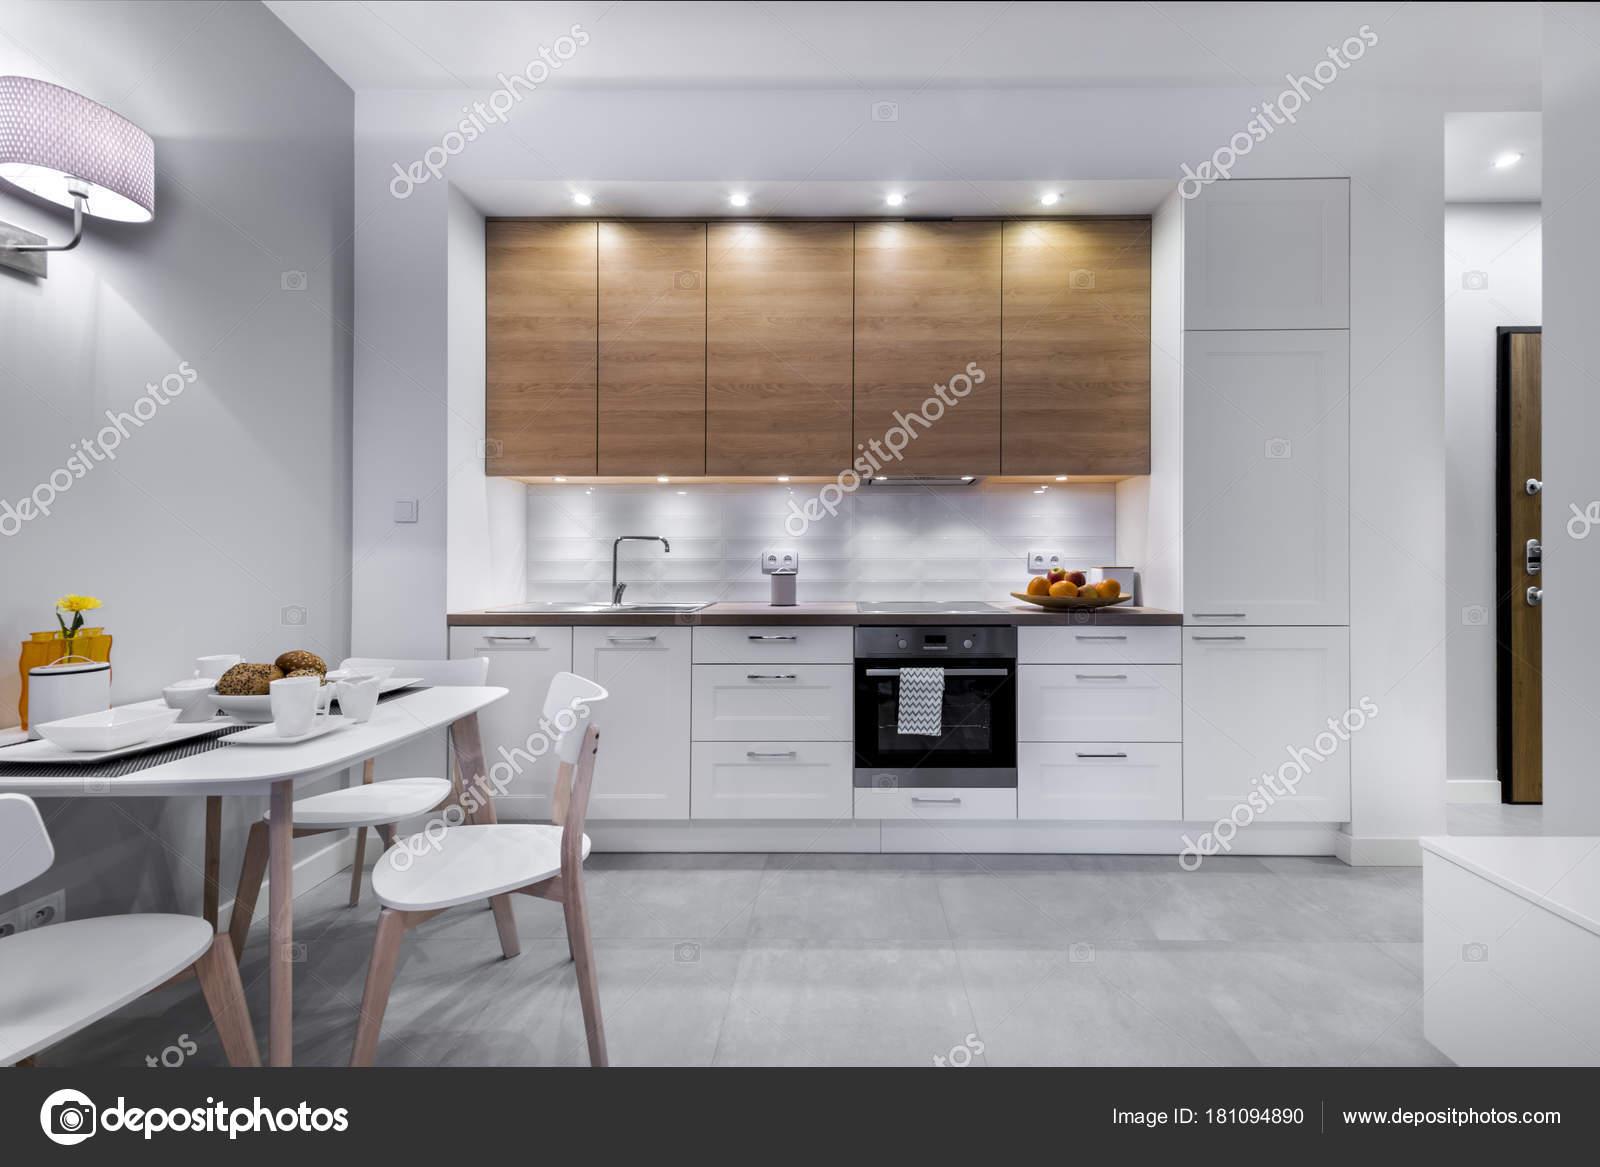 Arredamento cucina moderna — Foto Stock © jacek_kadaj #181094890